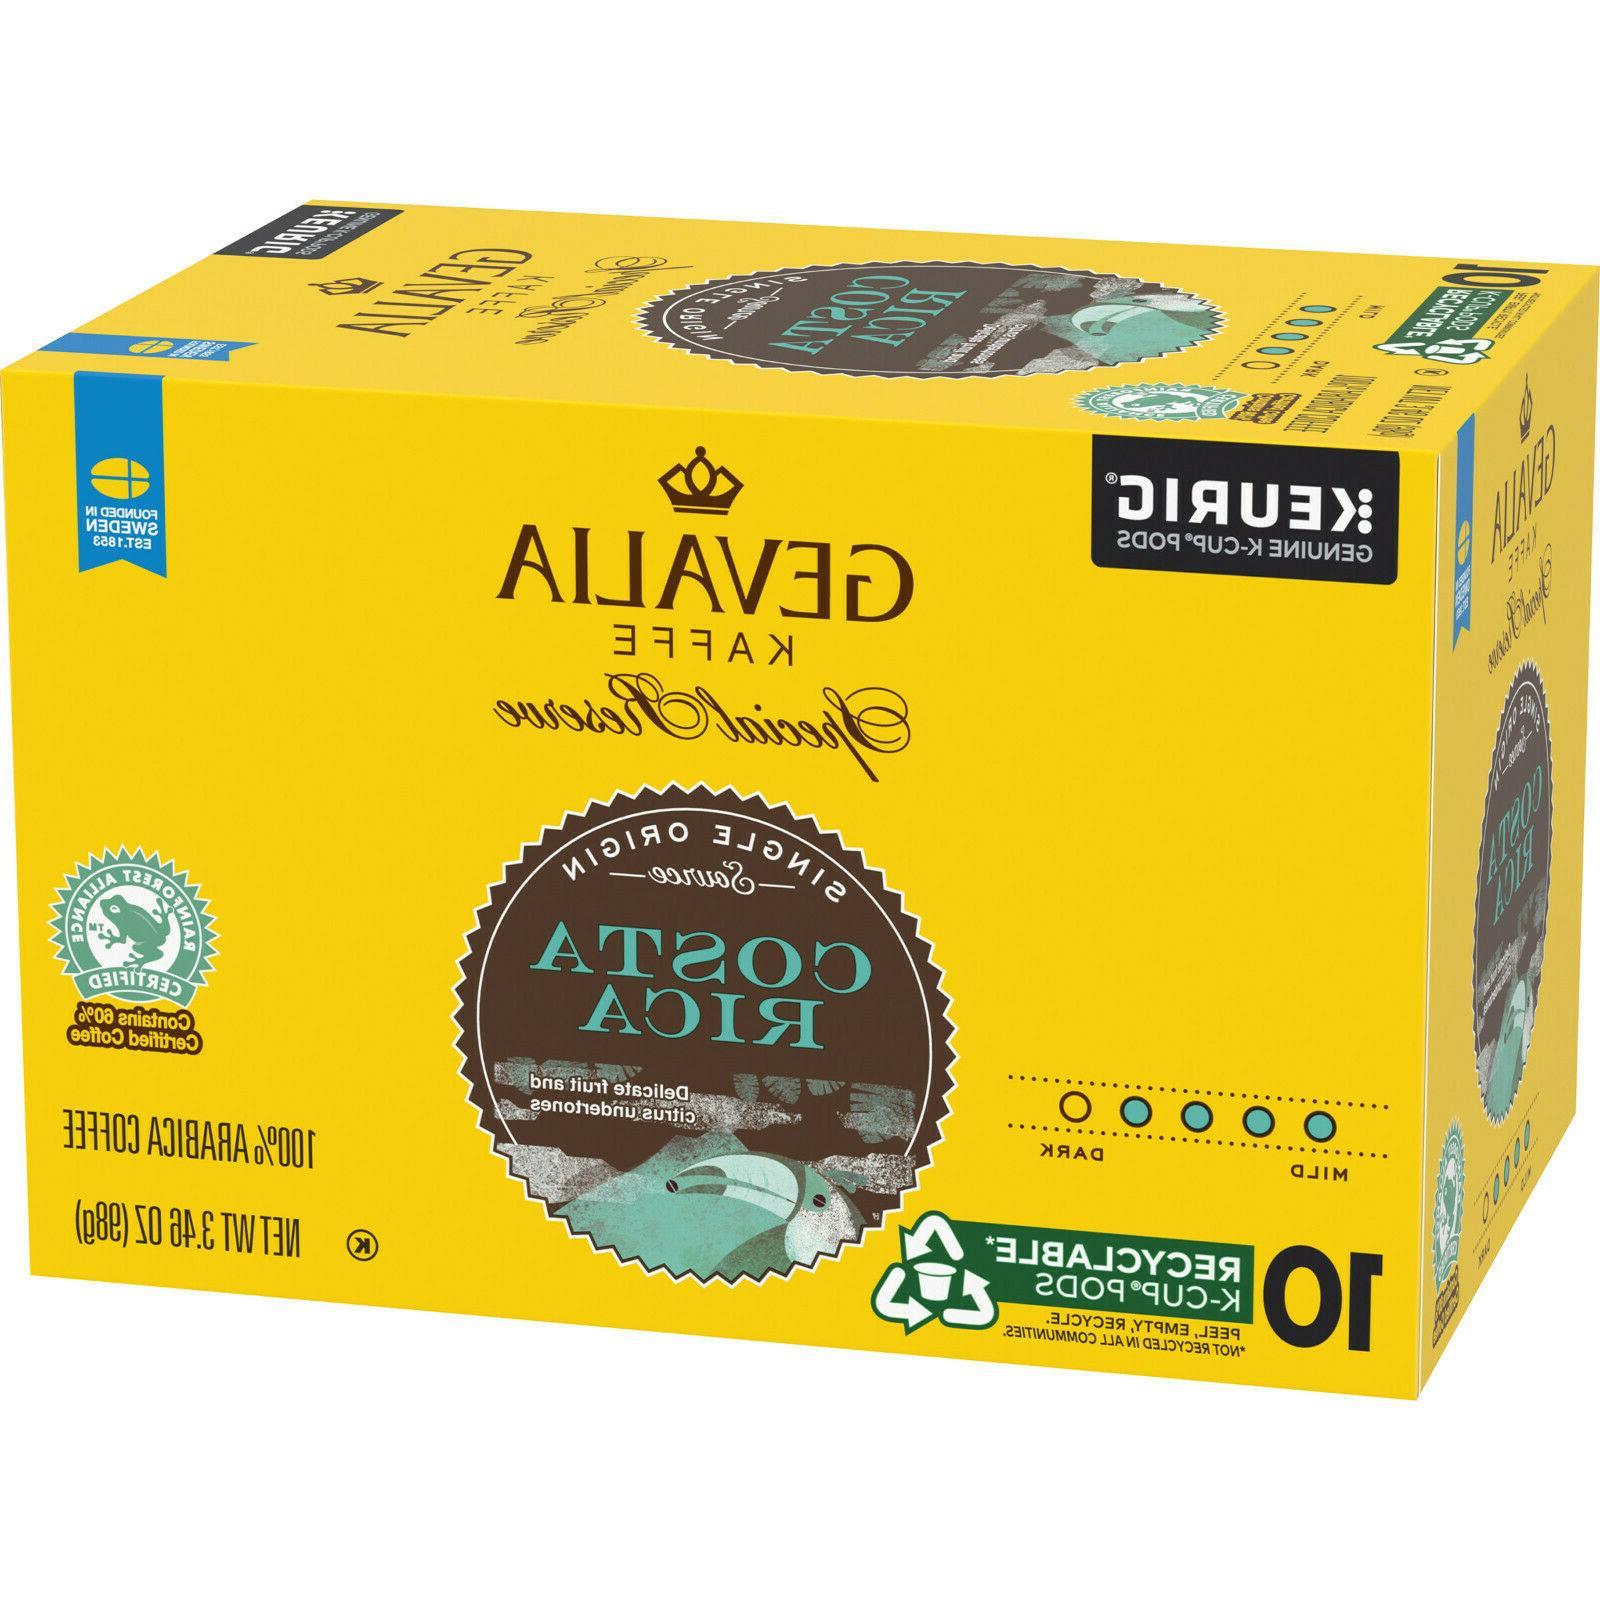 40 Gevalia Costa Blend Pods boxes 10 for